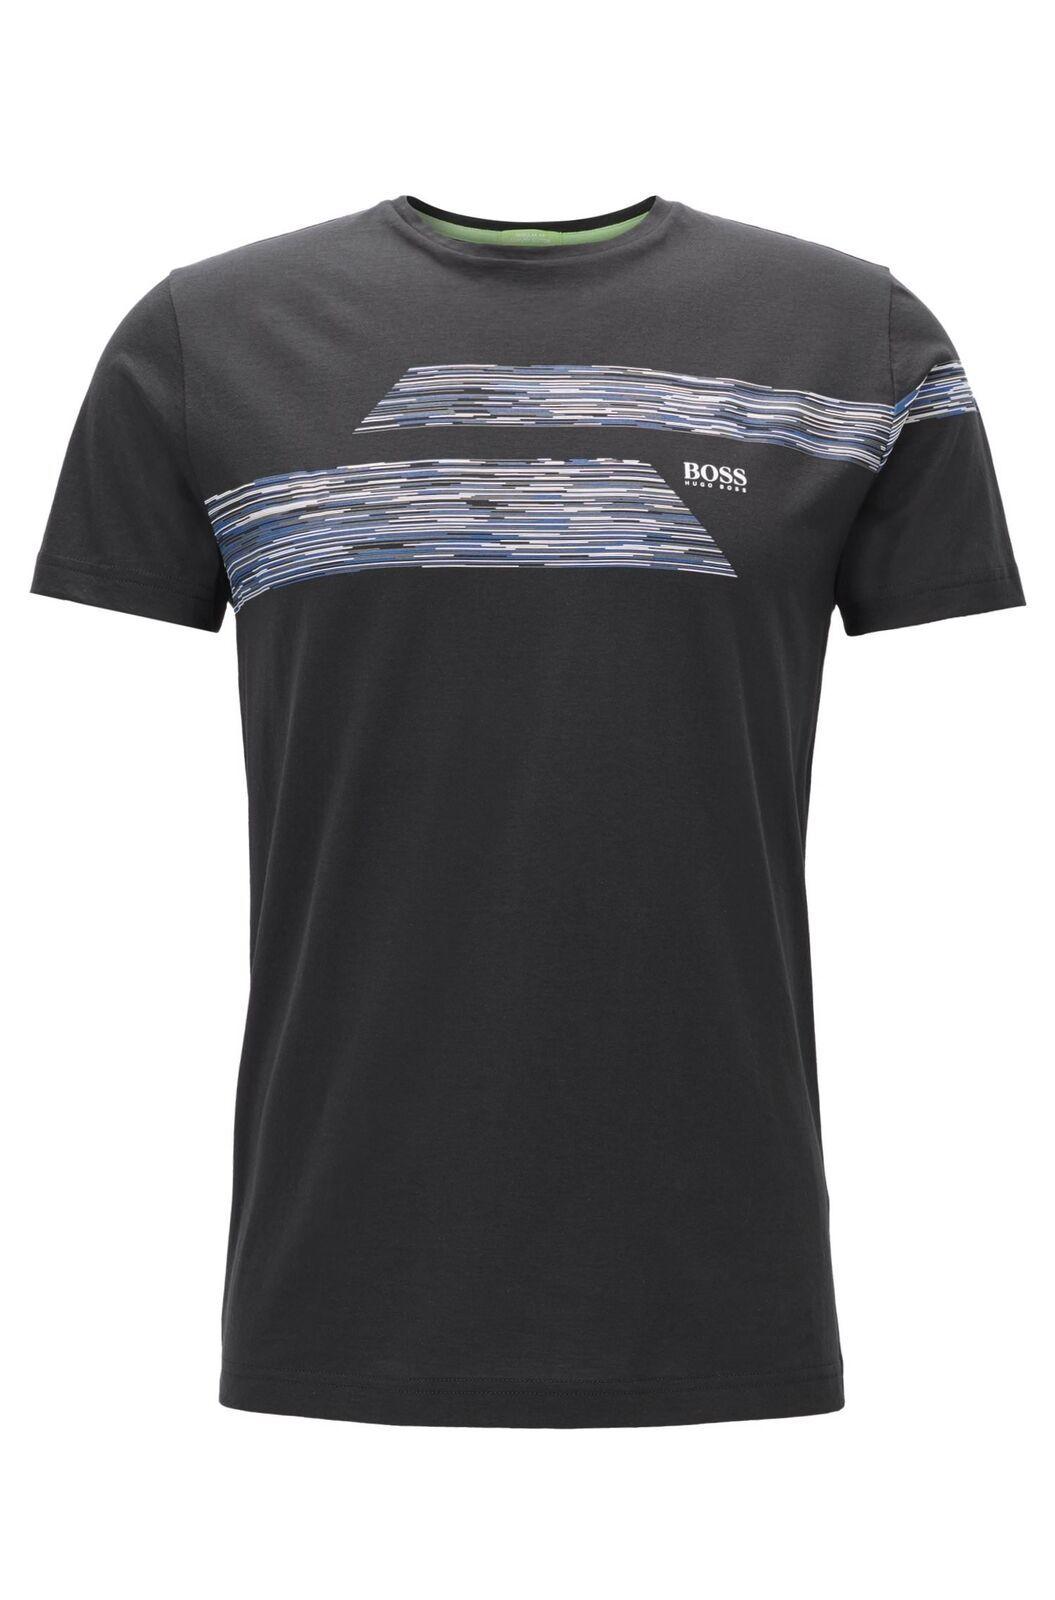 Hugo Boss Green Men's Graphic Premium Cotton Shirt T-shirt TEEP 1 50372545